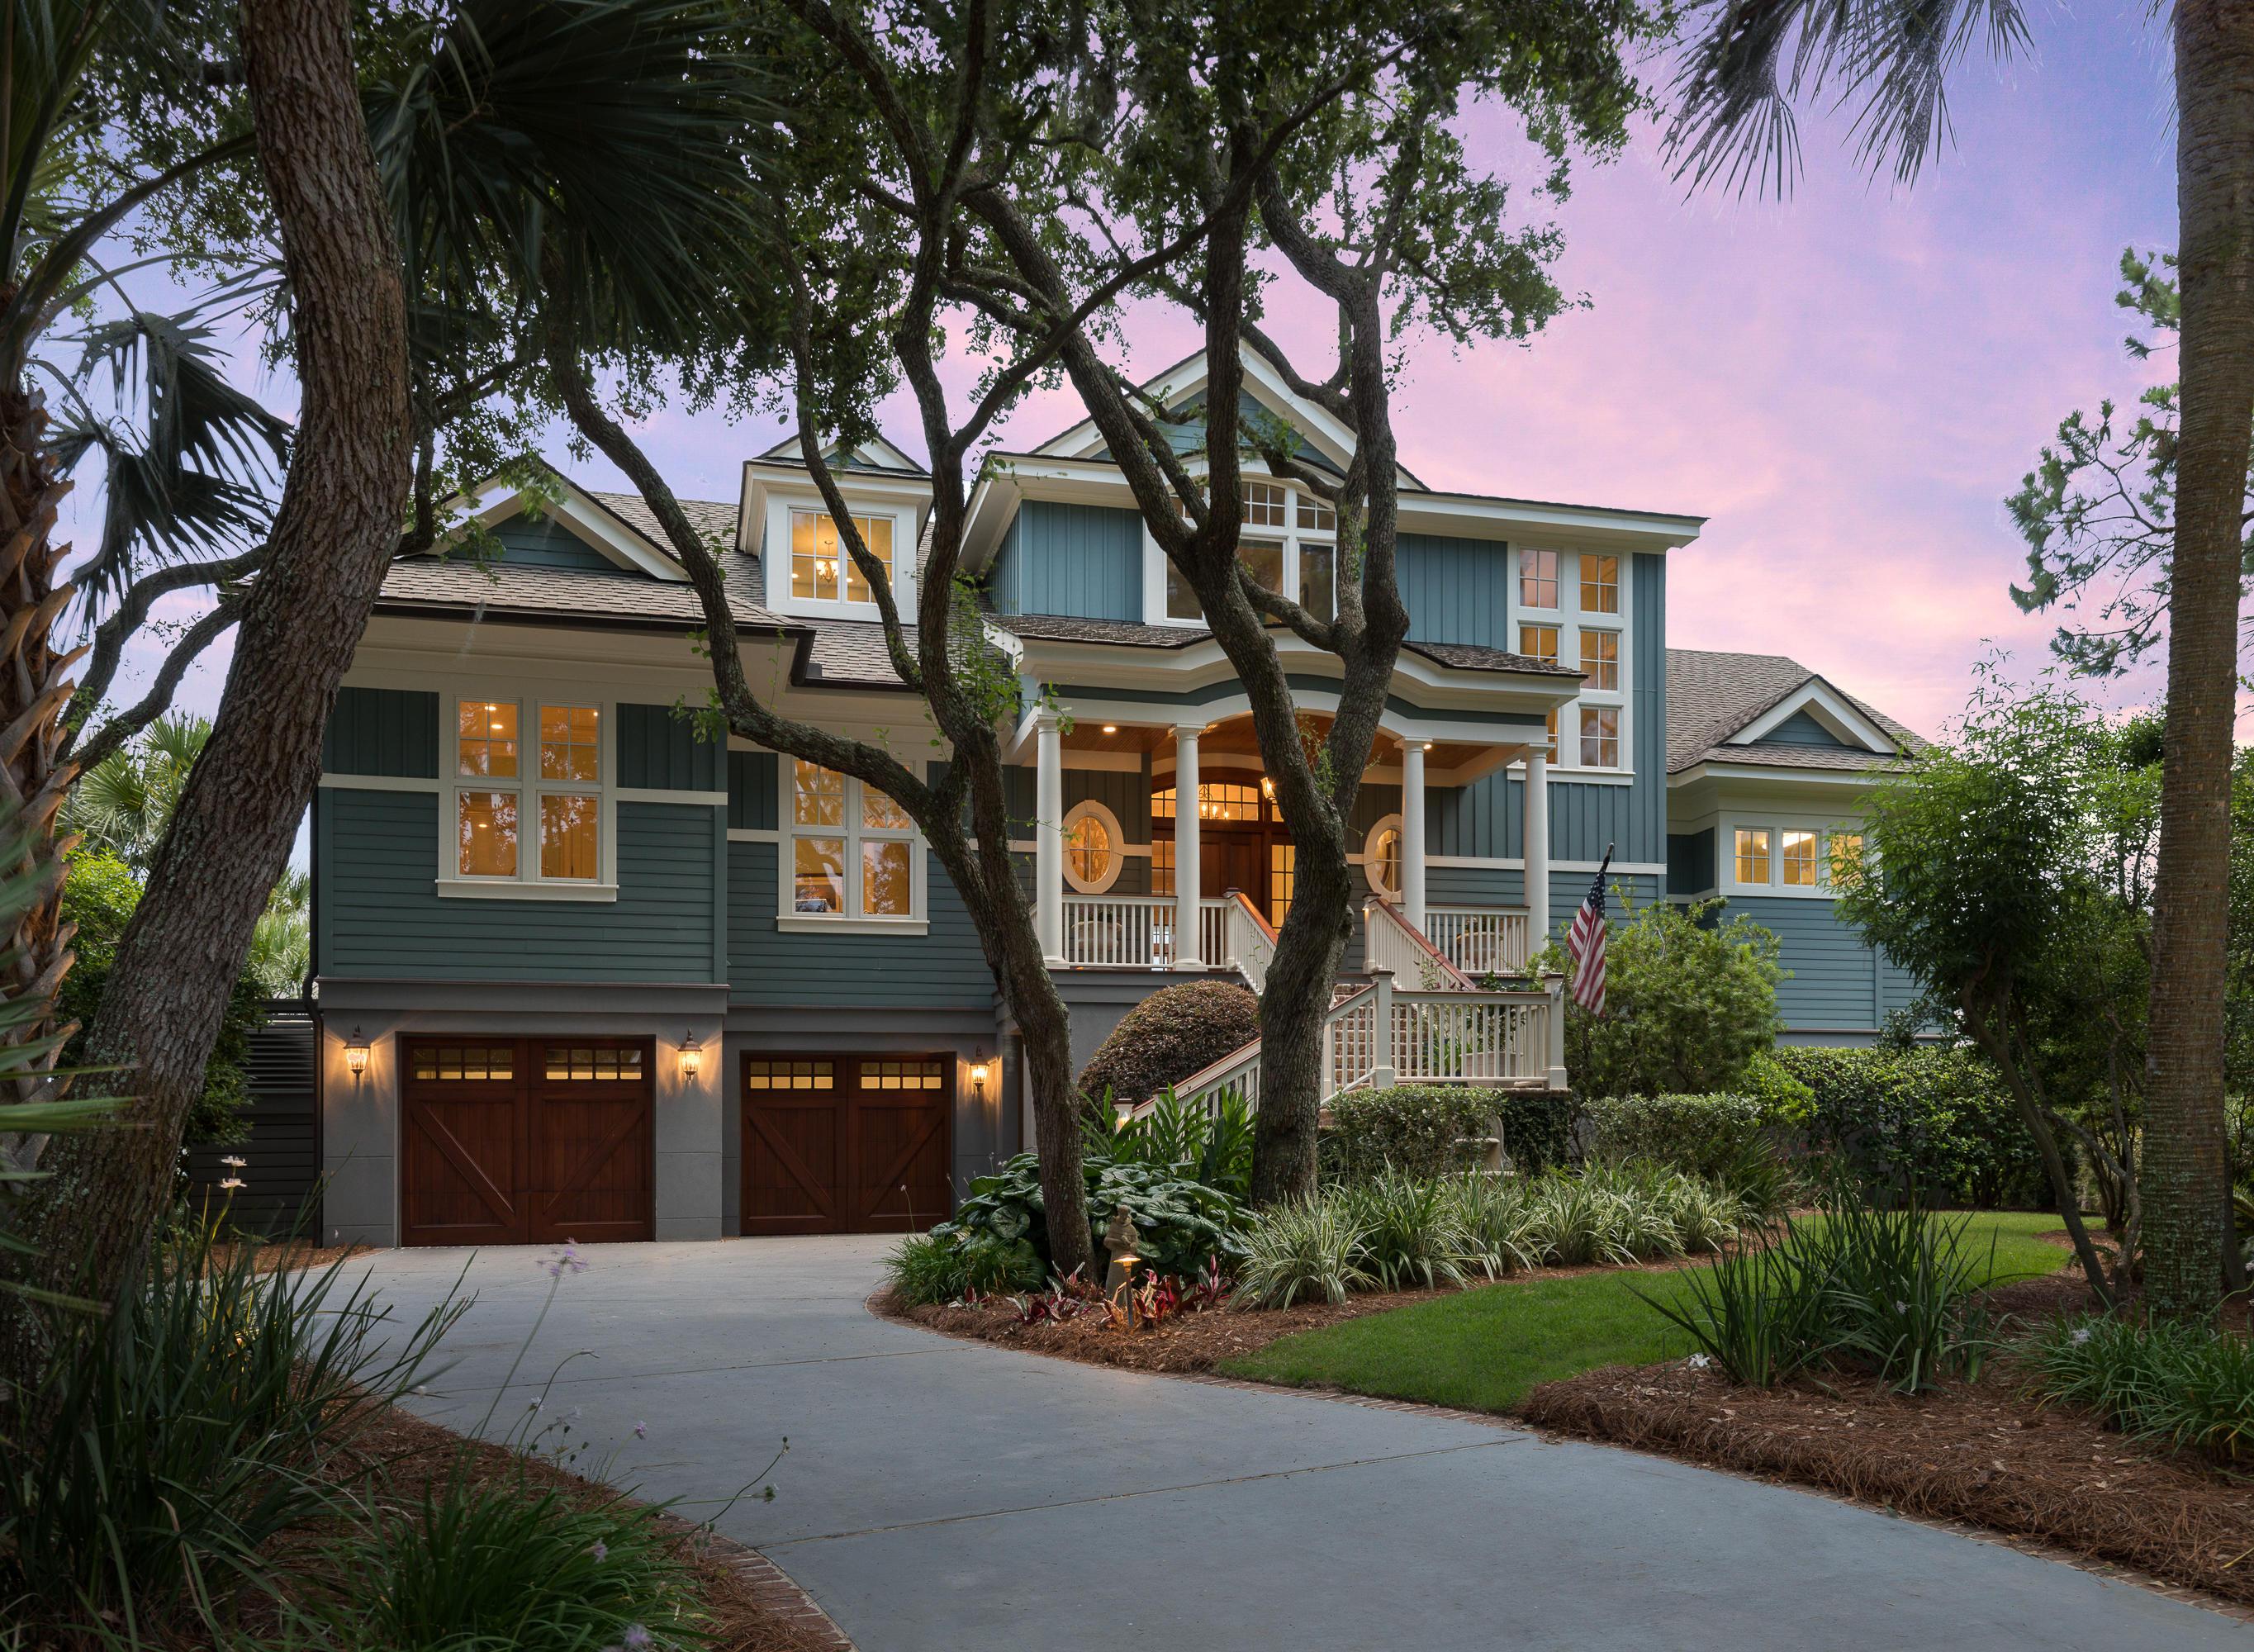 Seabrook Island Homes For Sale - 3033 Marshgate, Johns Island, SC - 13